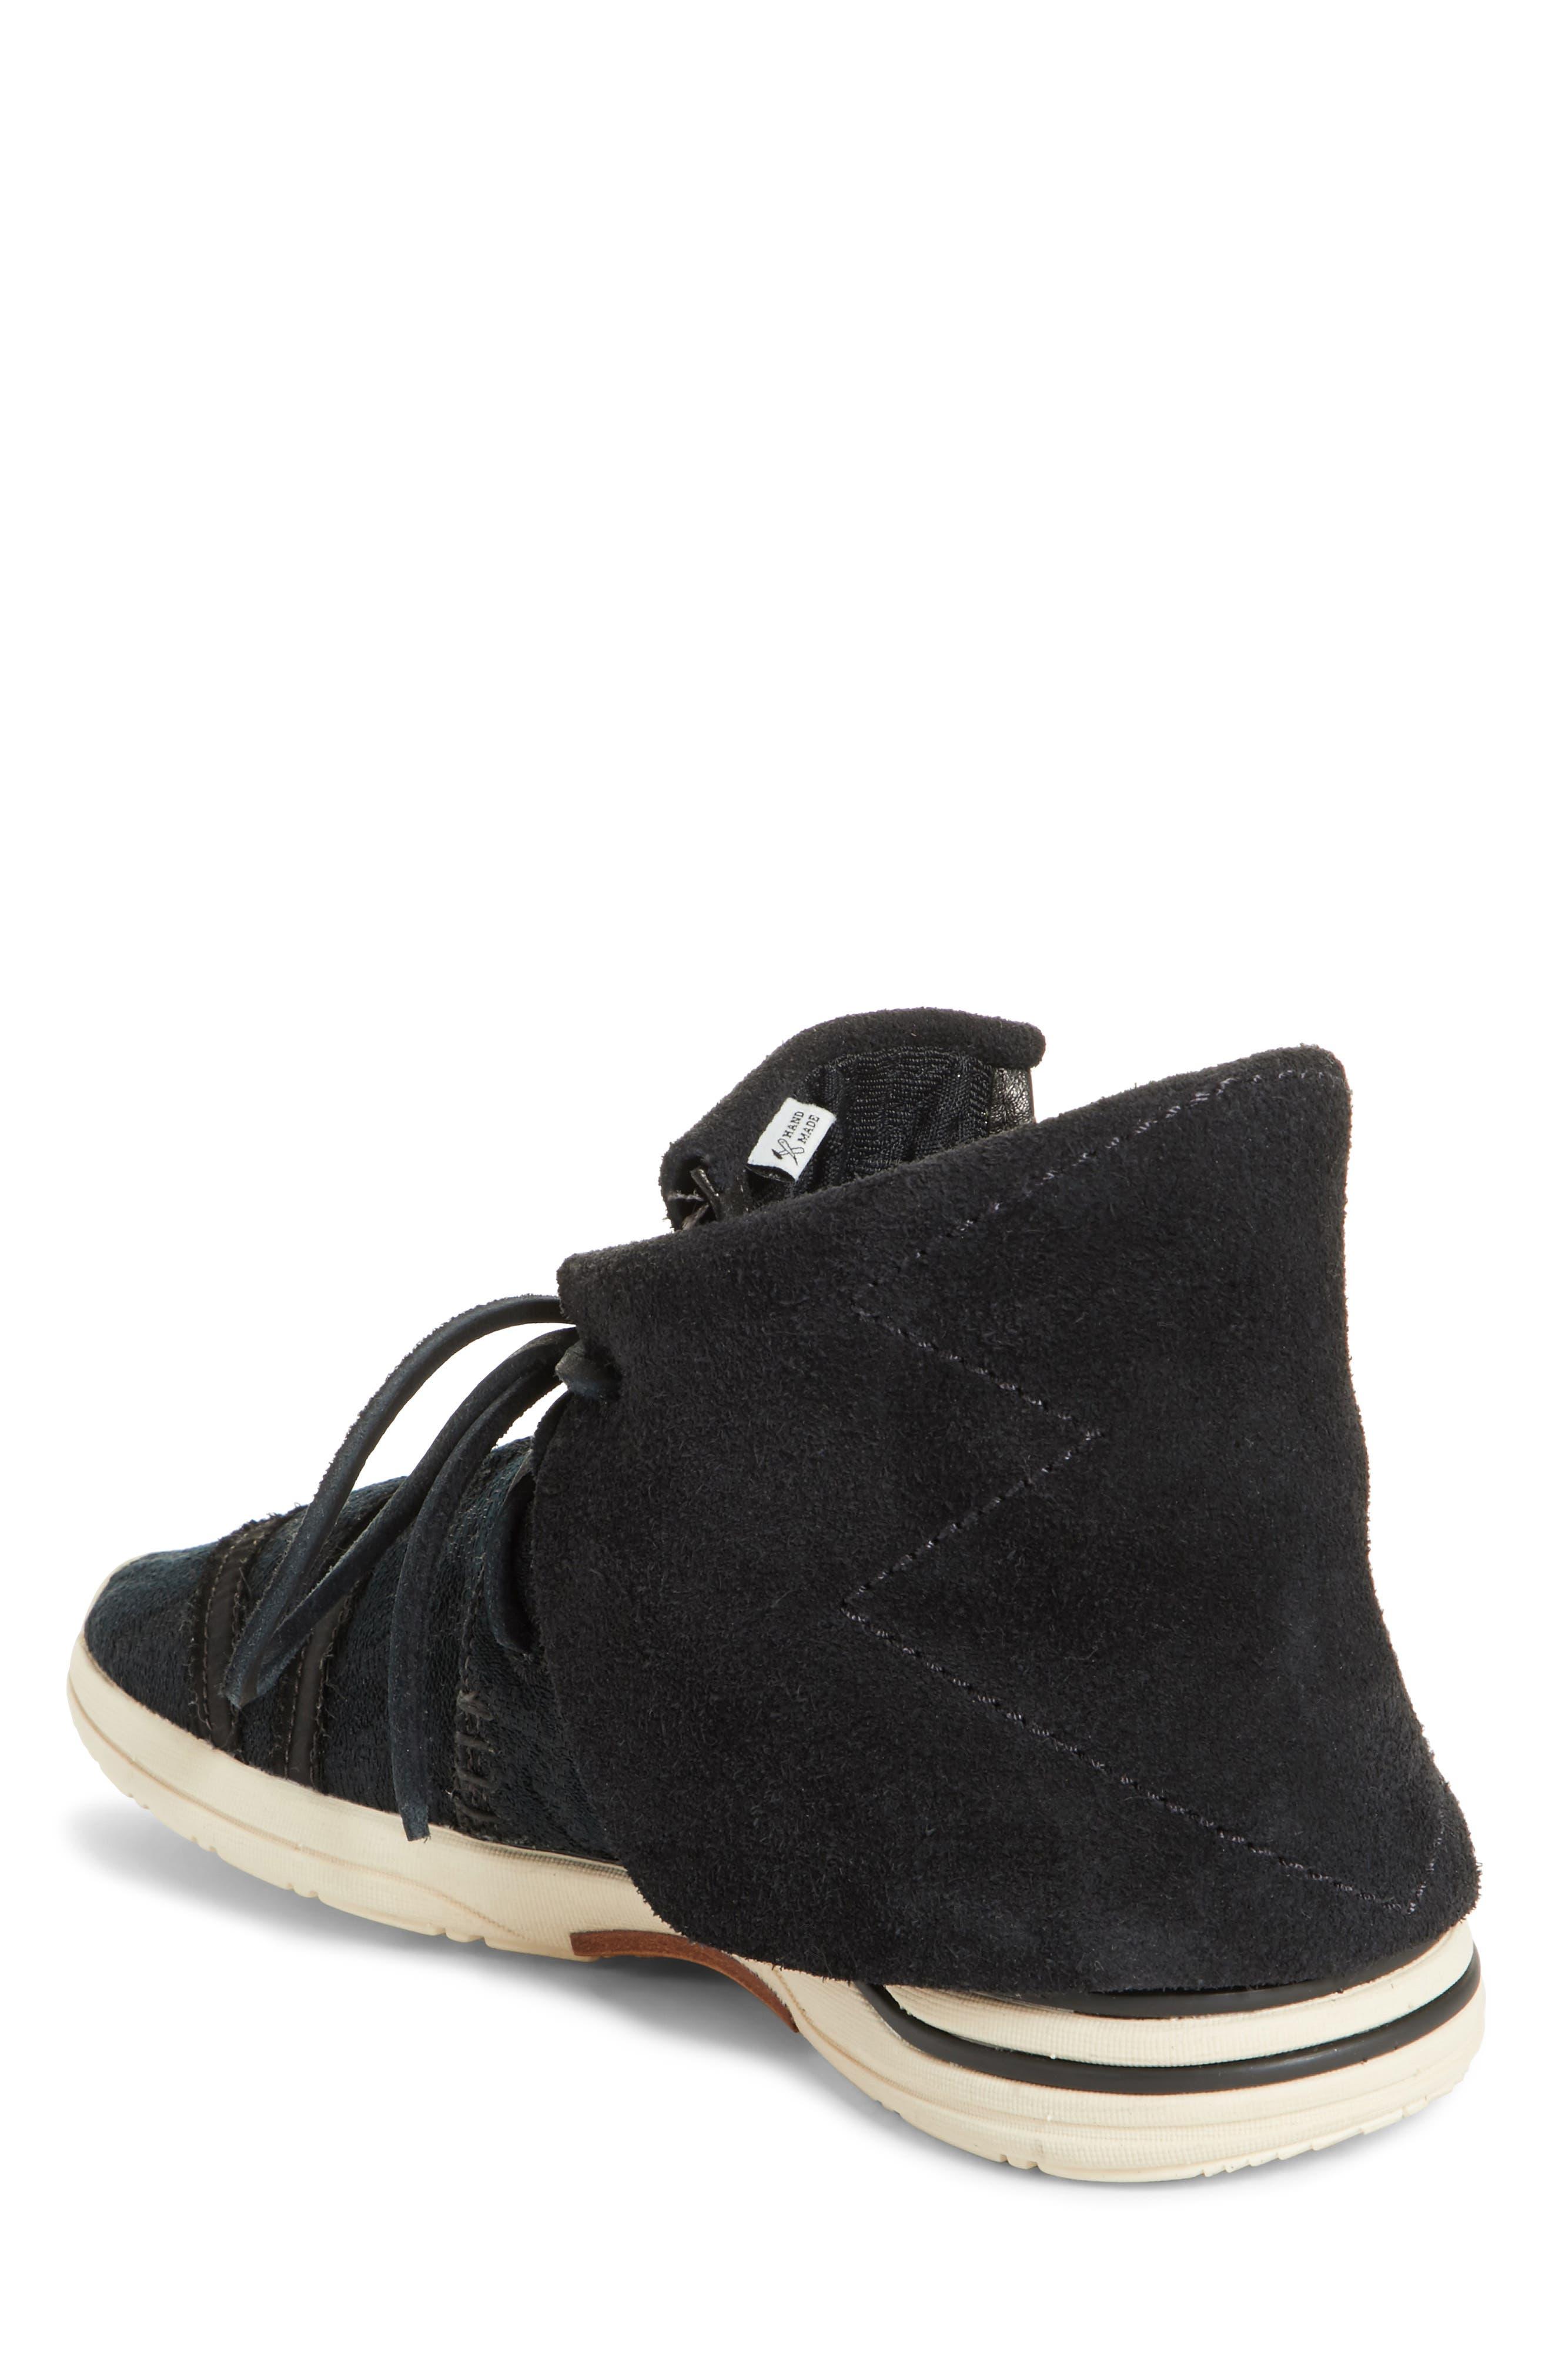 Huron Lhamo Hi Folk Hidden Wedge Sneaker,                             Alternate thumbnail 2, color,                             004